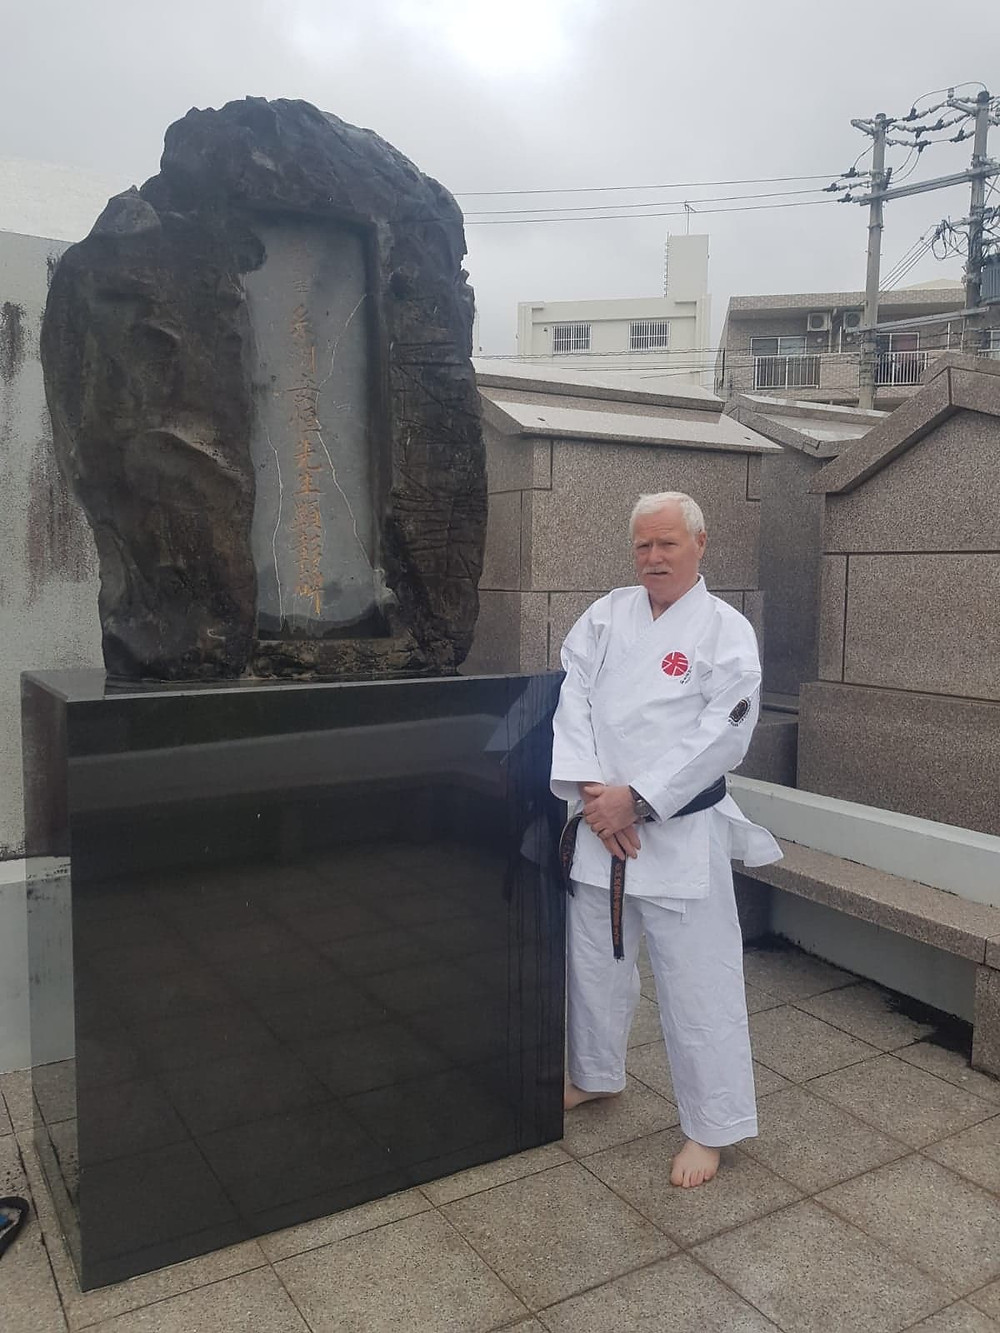 Sensei C. Hunter visits the monument of Master Anko Itosu in Okinawa